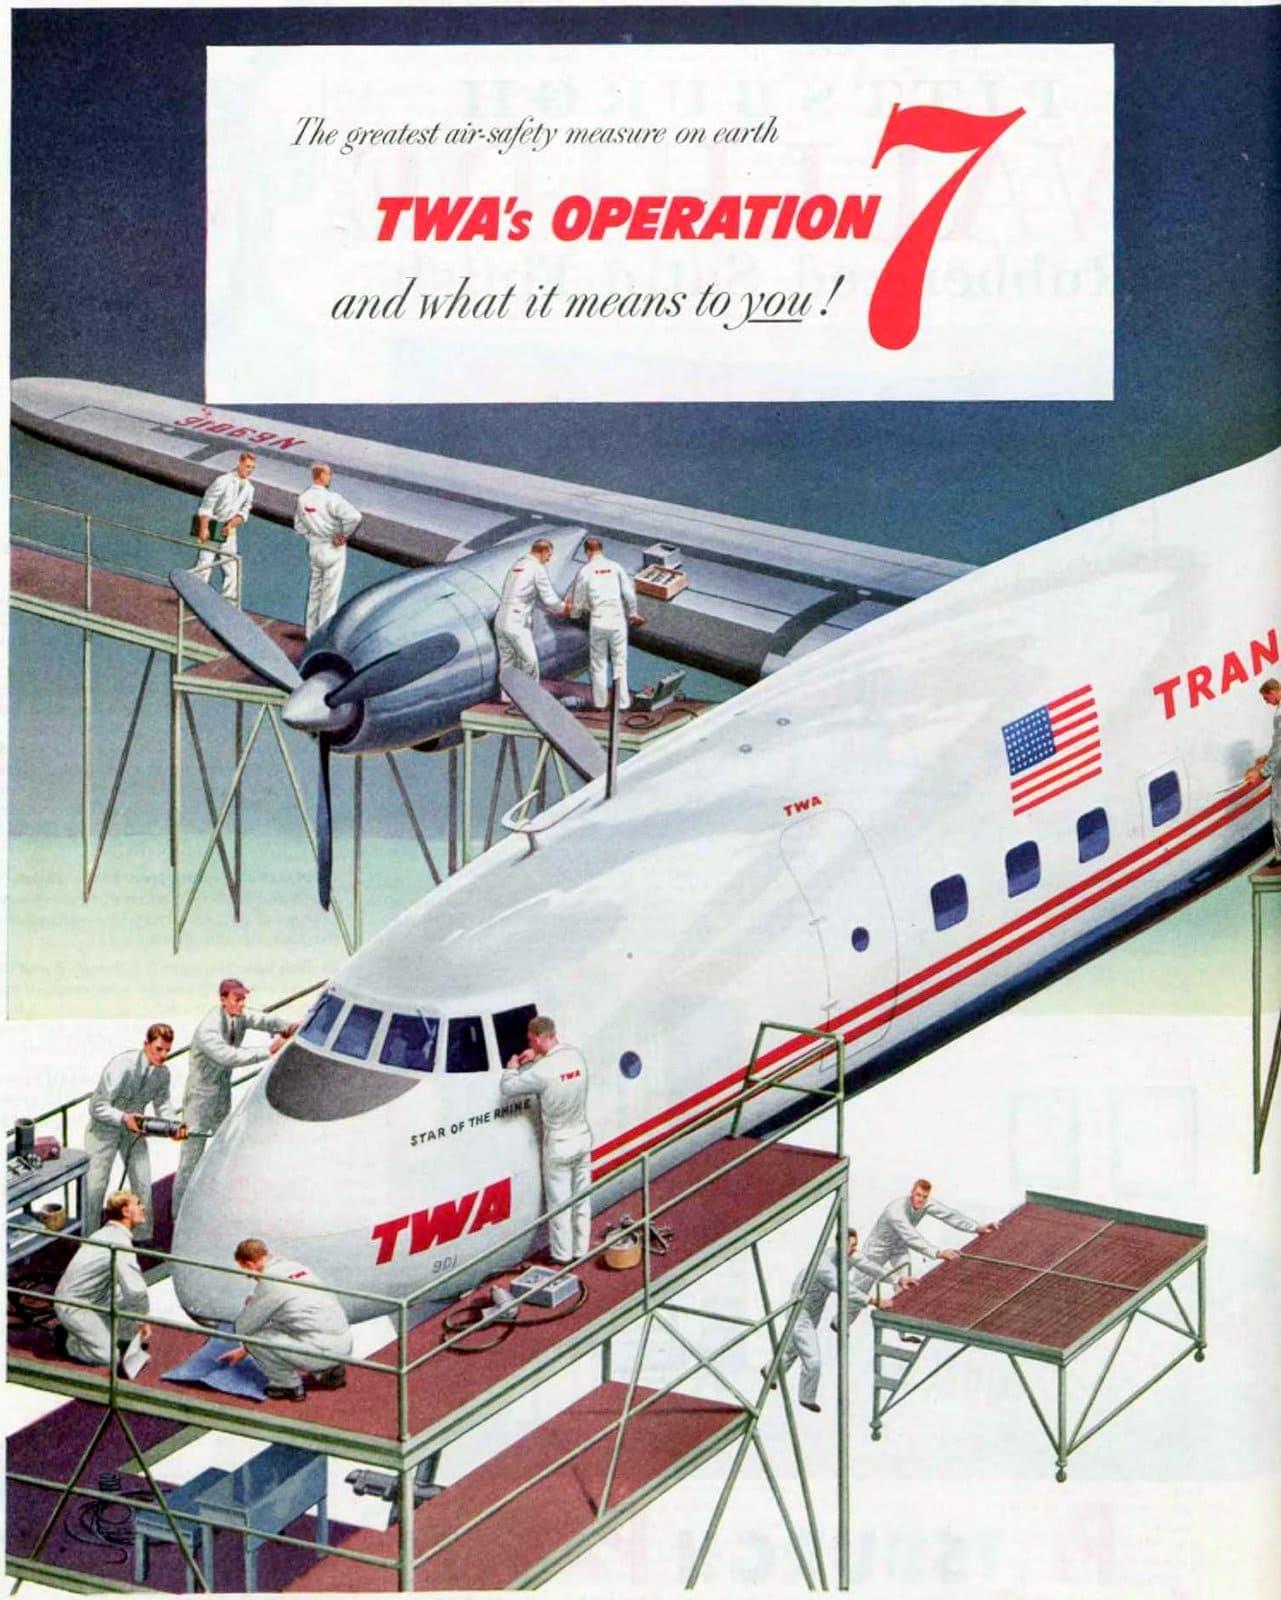 Trans-World propeller plane in maintenance - 1952 (2)